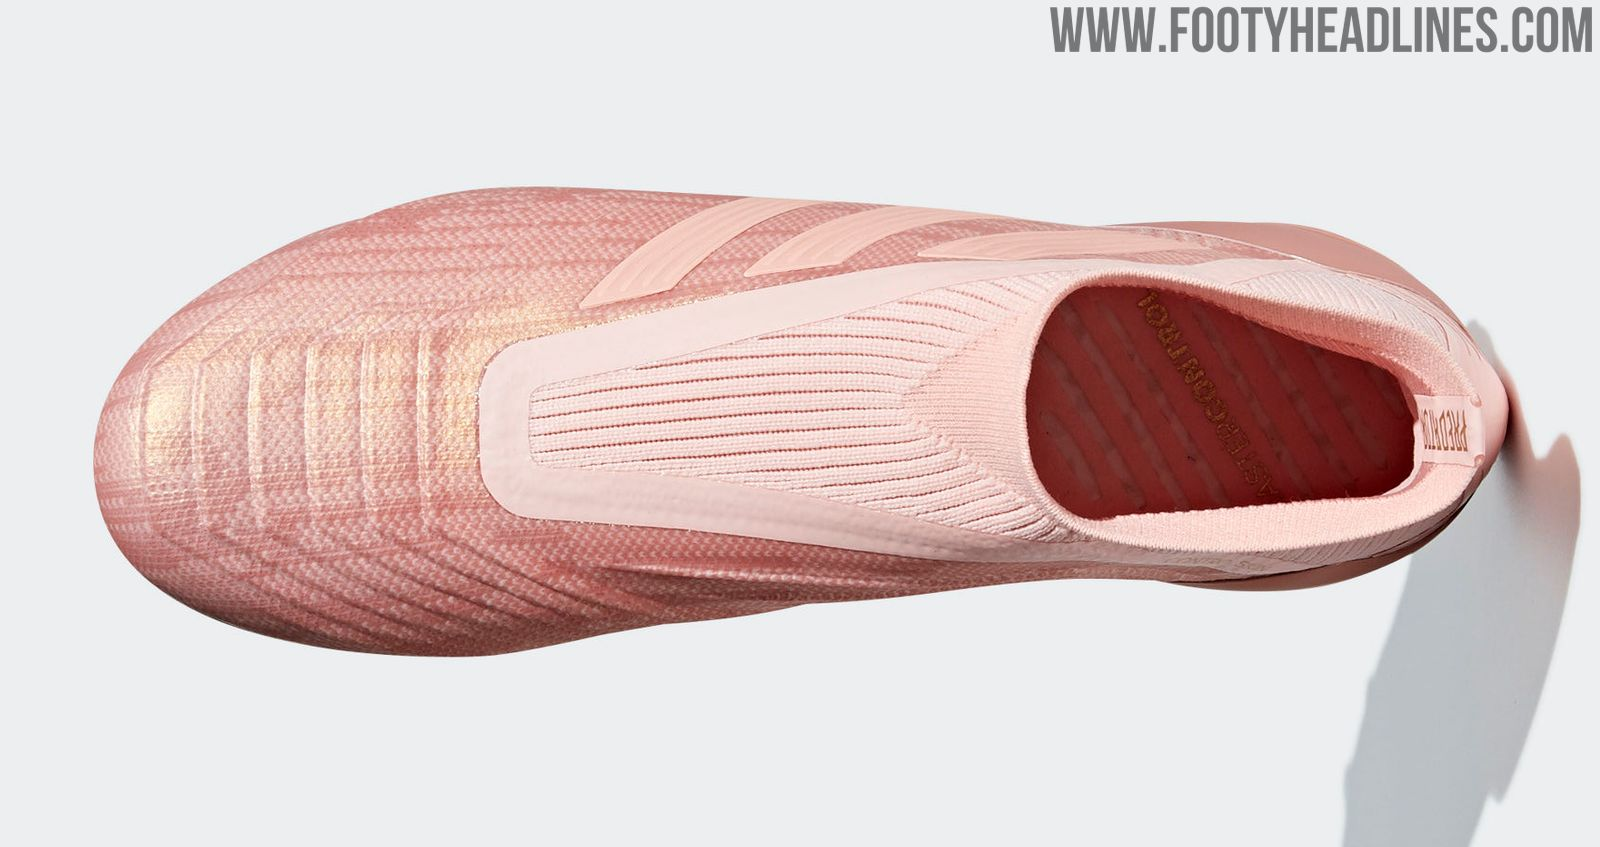 d1438ca4775 Adidas Spectral Mode Pack - Predator